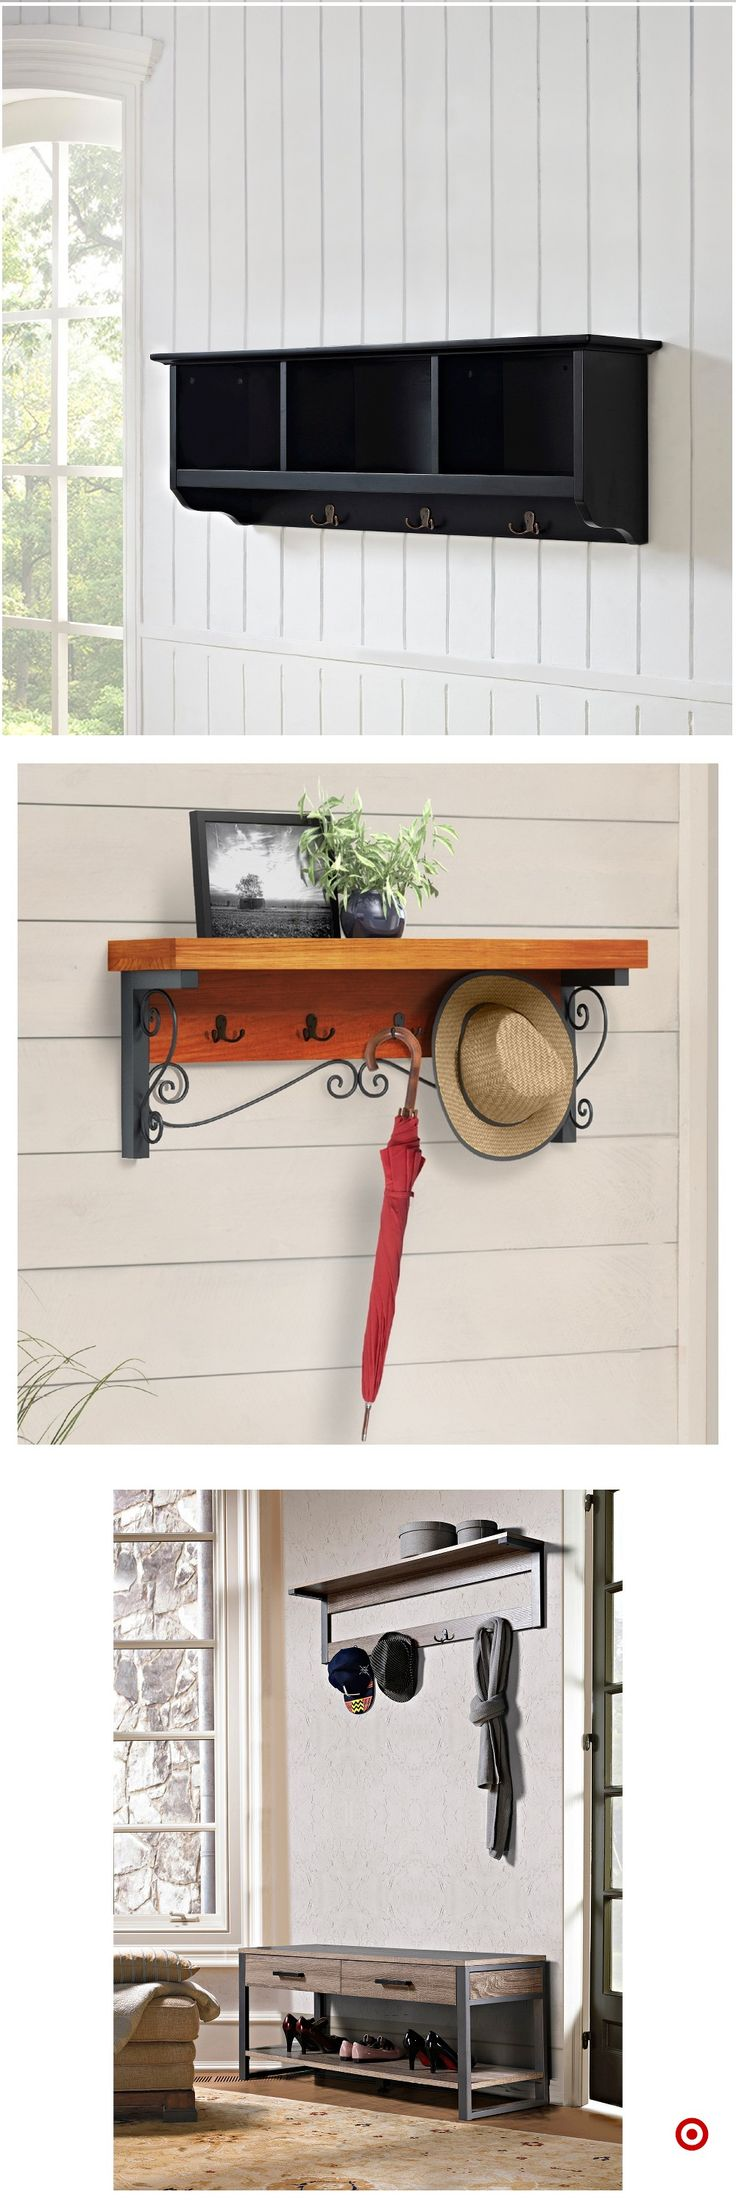 best 25 wall mounted coat rack ideas on pinterest diy coat rack wall mounted coat hanger and. Black Bedroom Furniture Sets. Home Design Ideas